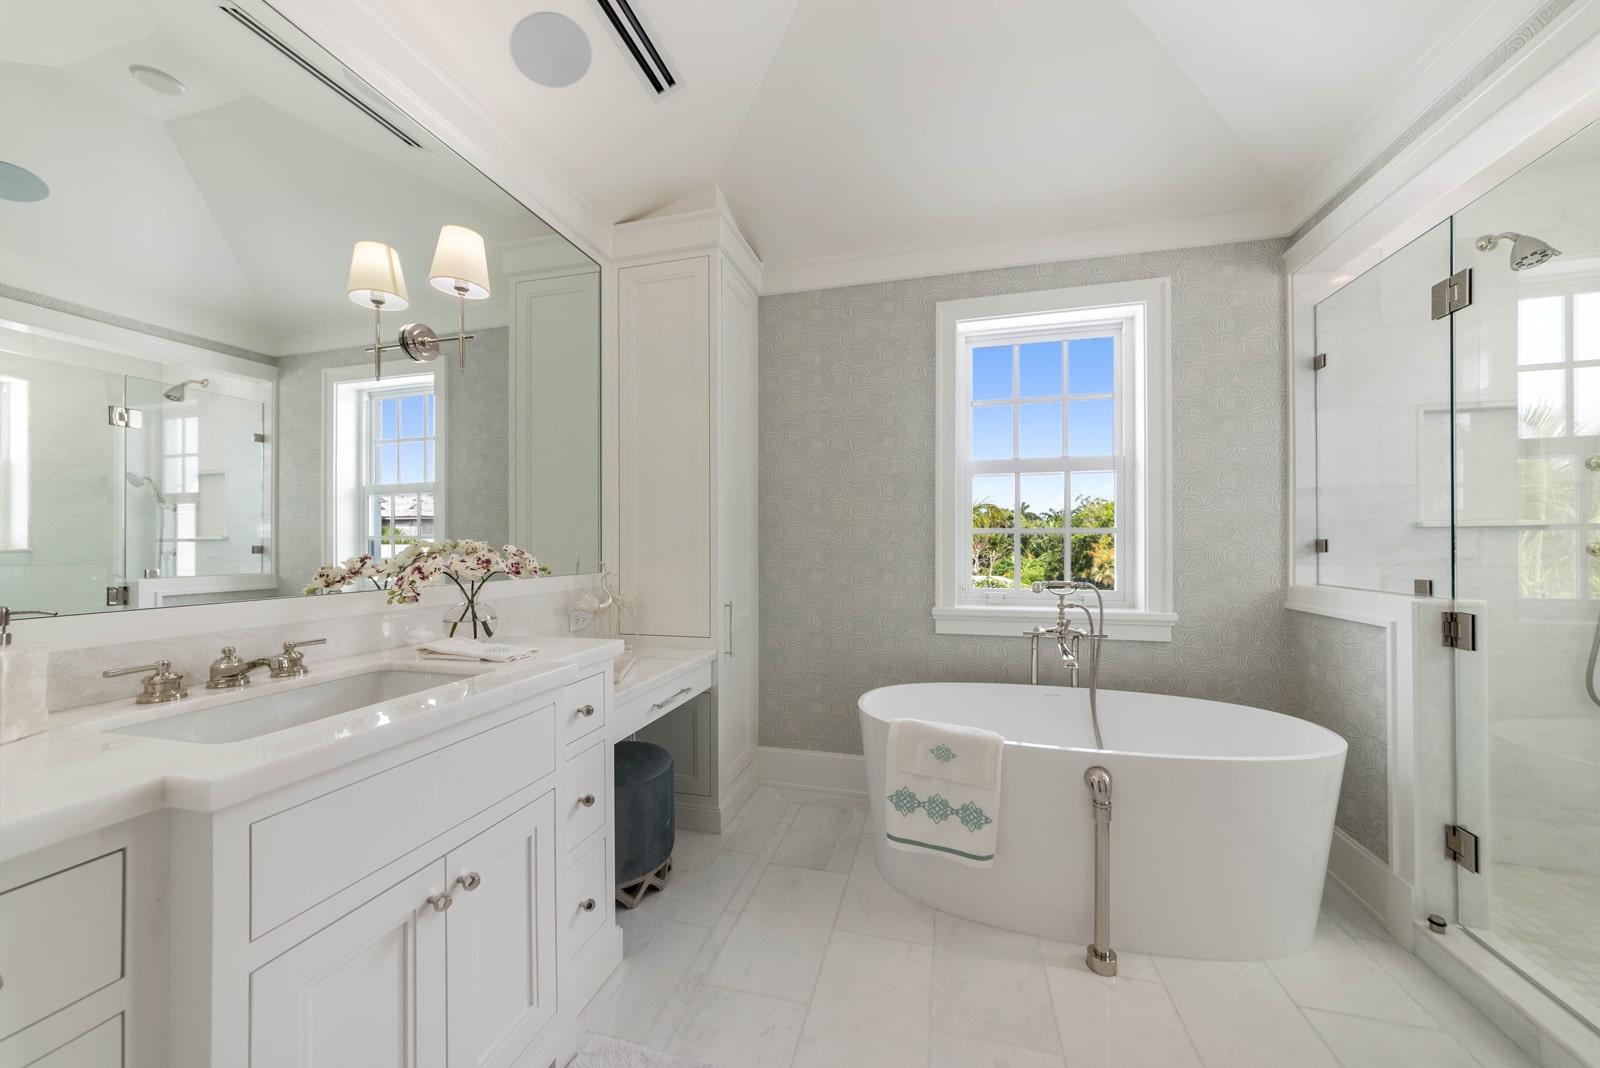 ecclestone-homes-bathroom-remodel-pg03-min